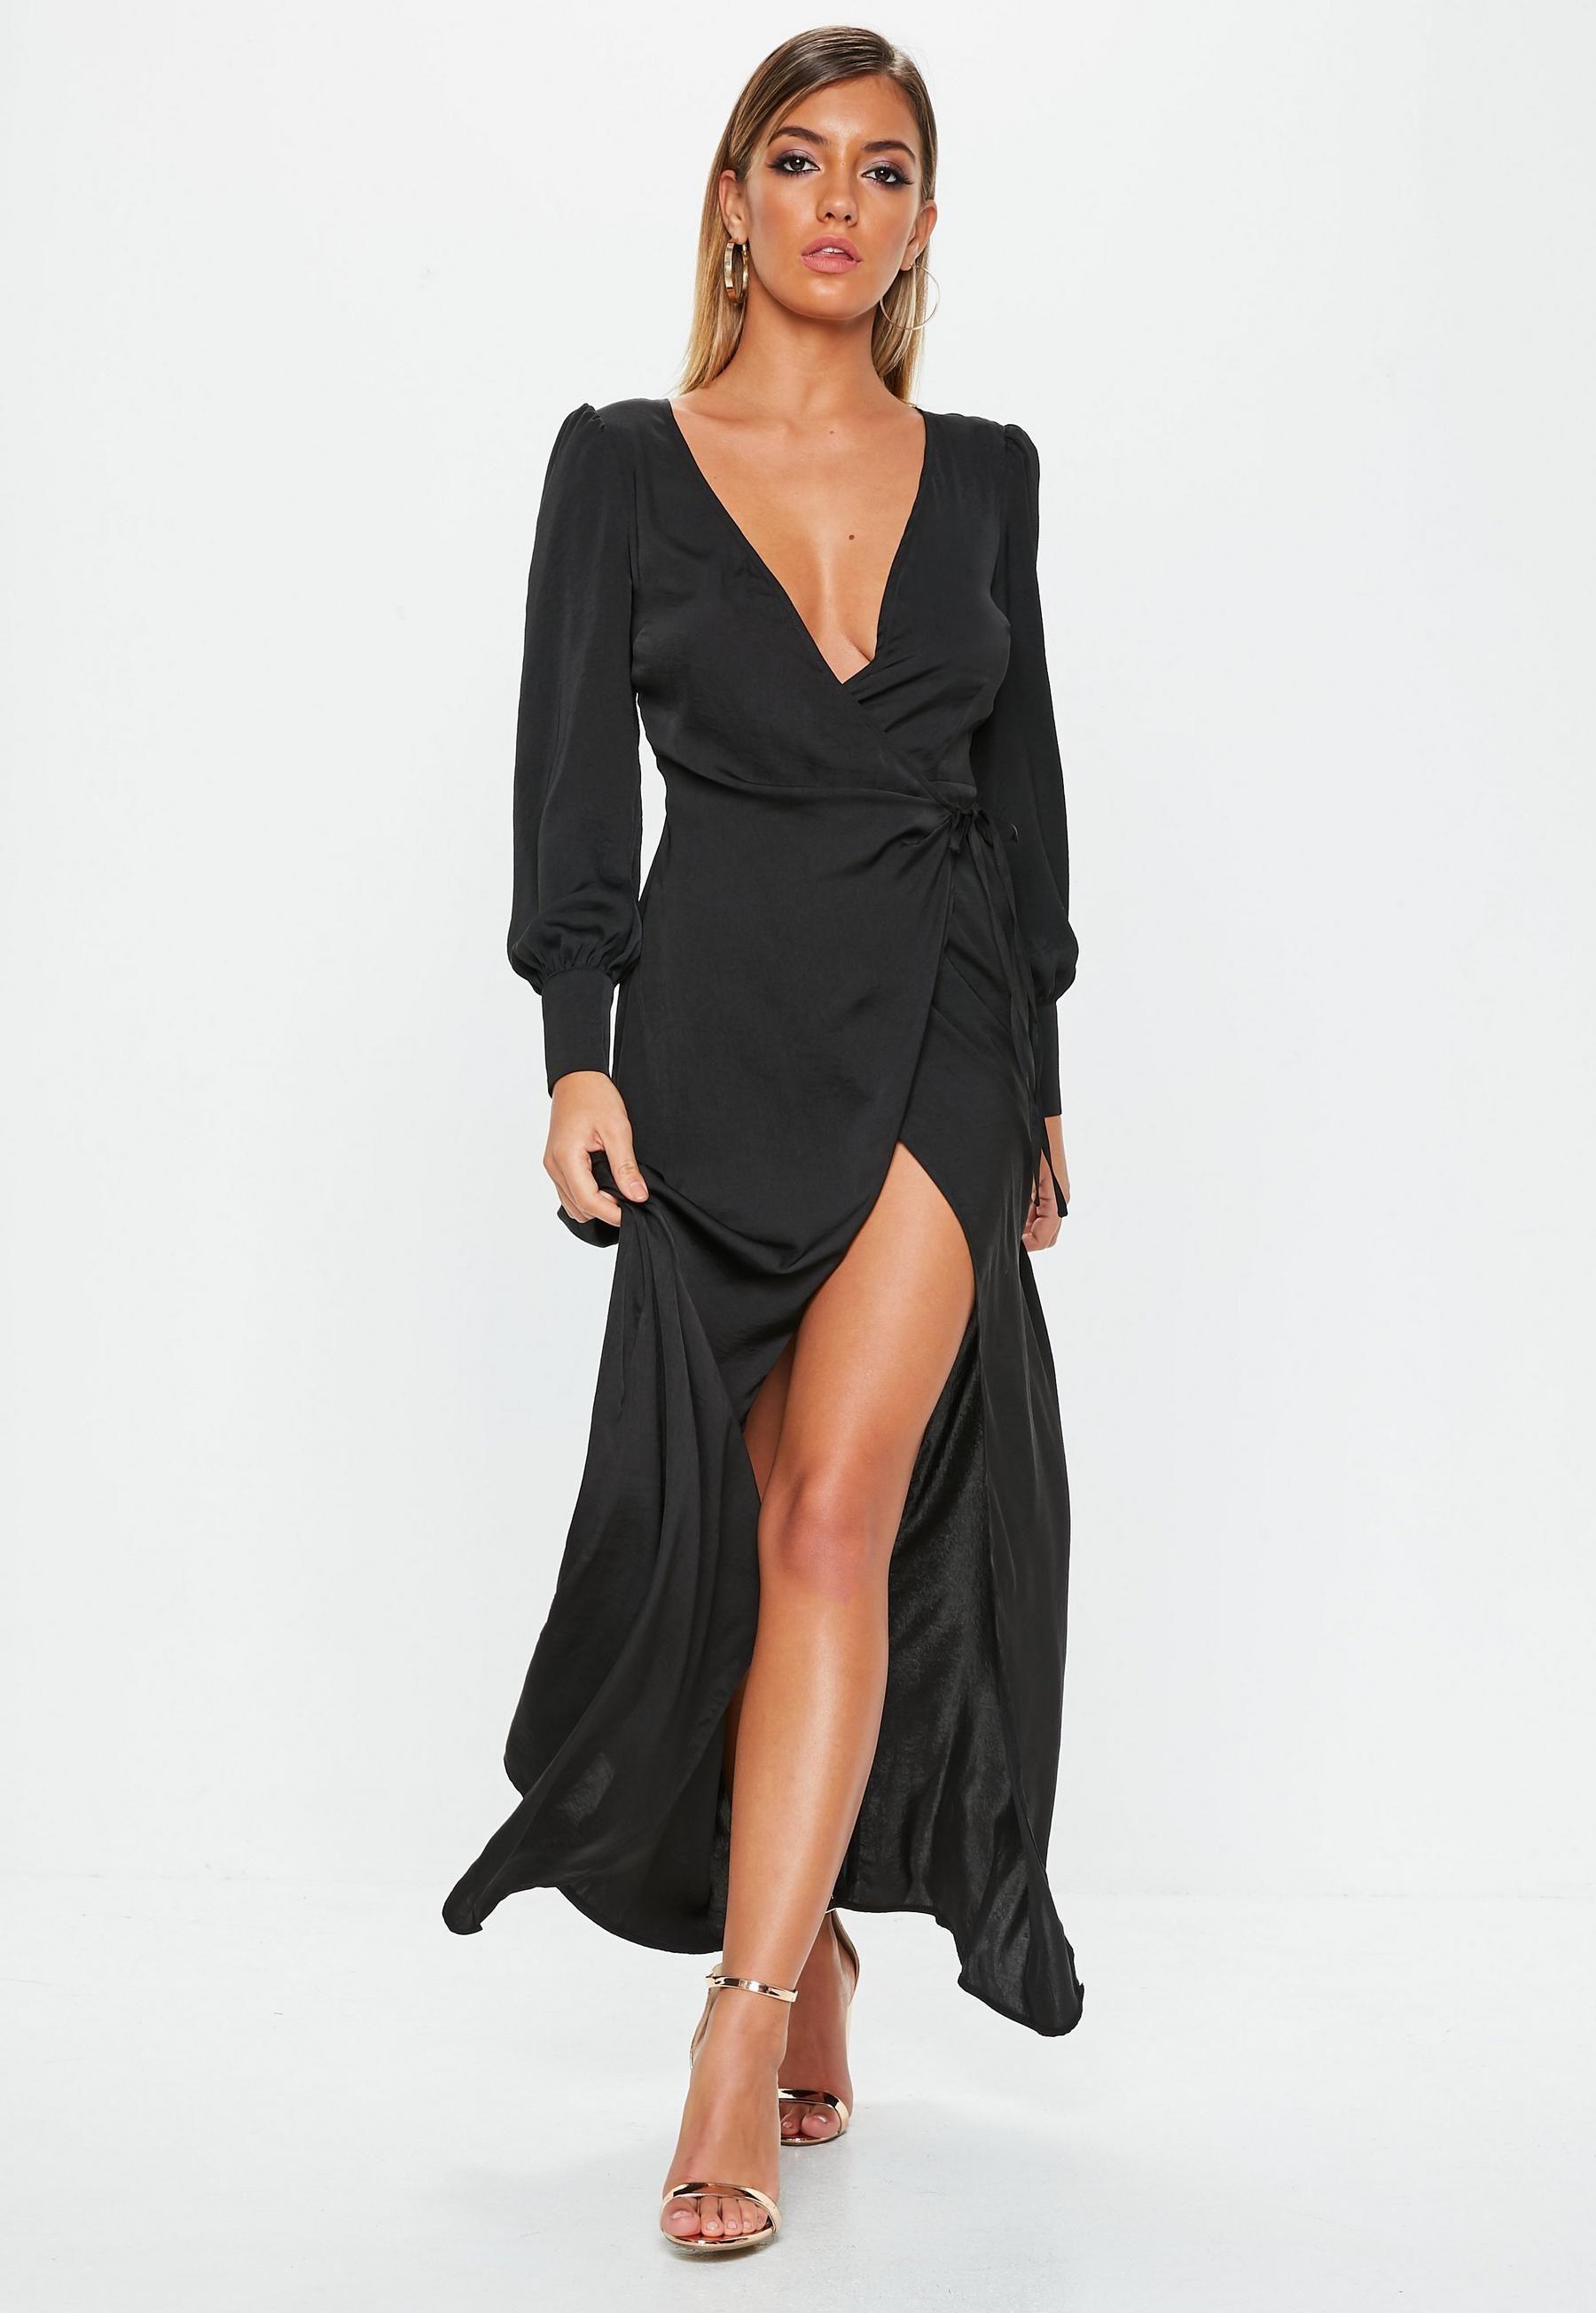 Black Satin Tie Side Maxi Dress Missguided Dresses Trending Dresses Shop Maxi Dresses [ 2608 x 1800 Pixel ]